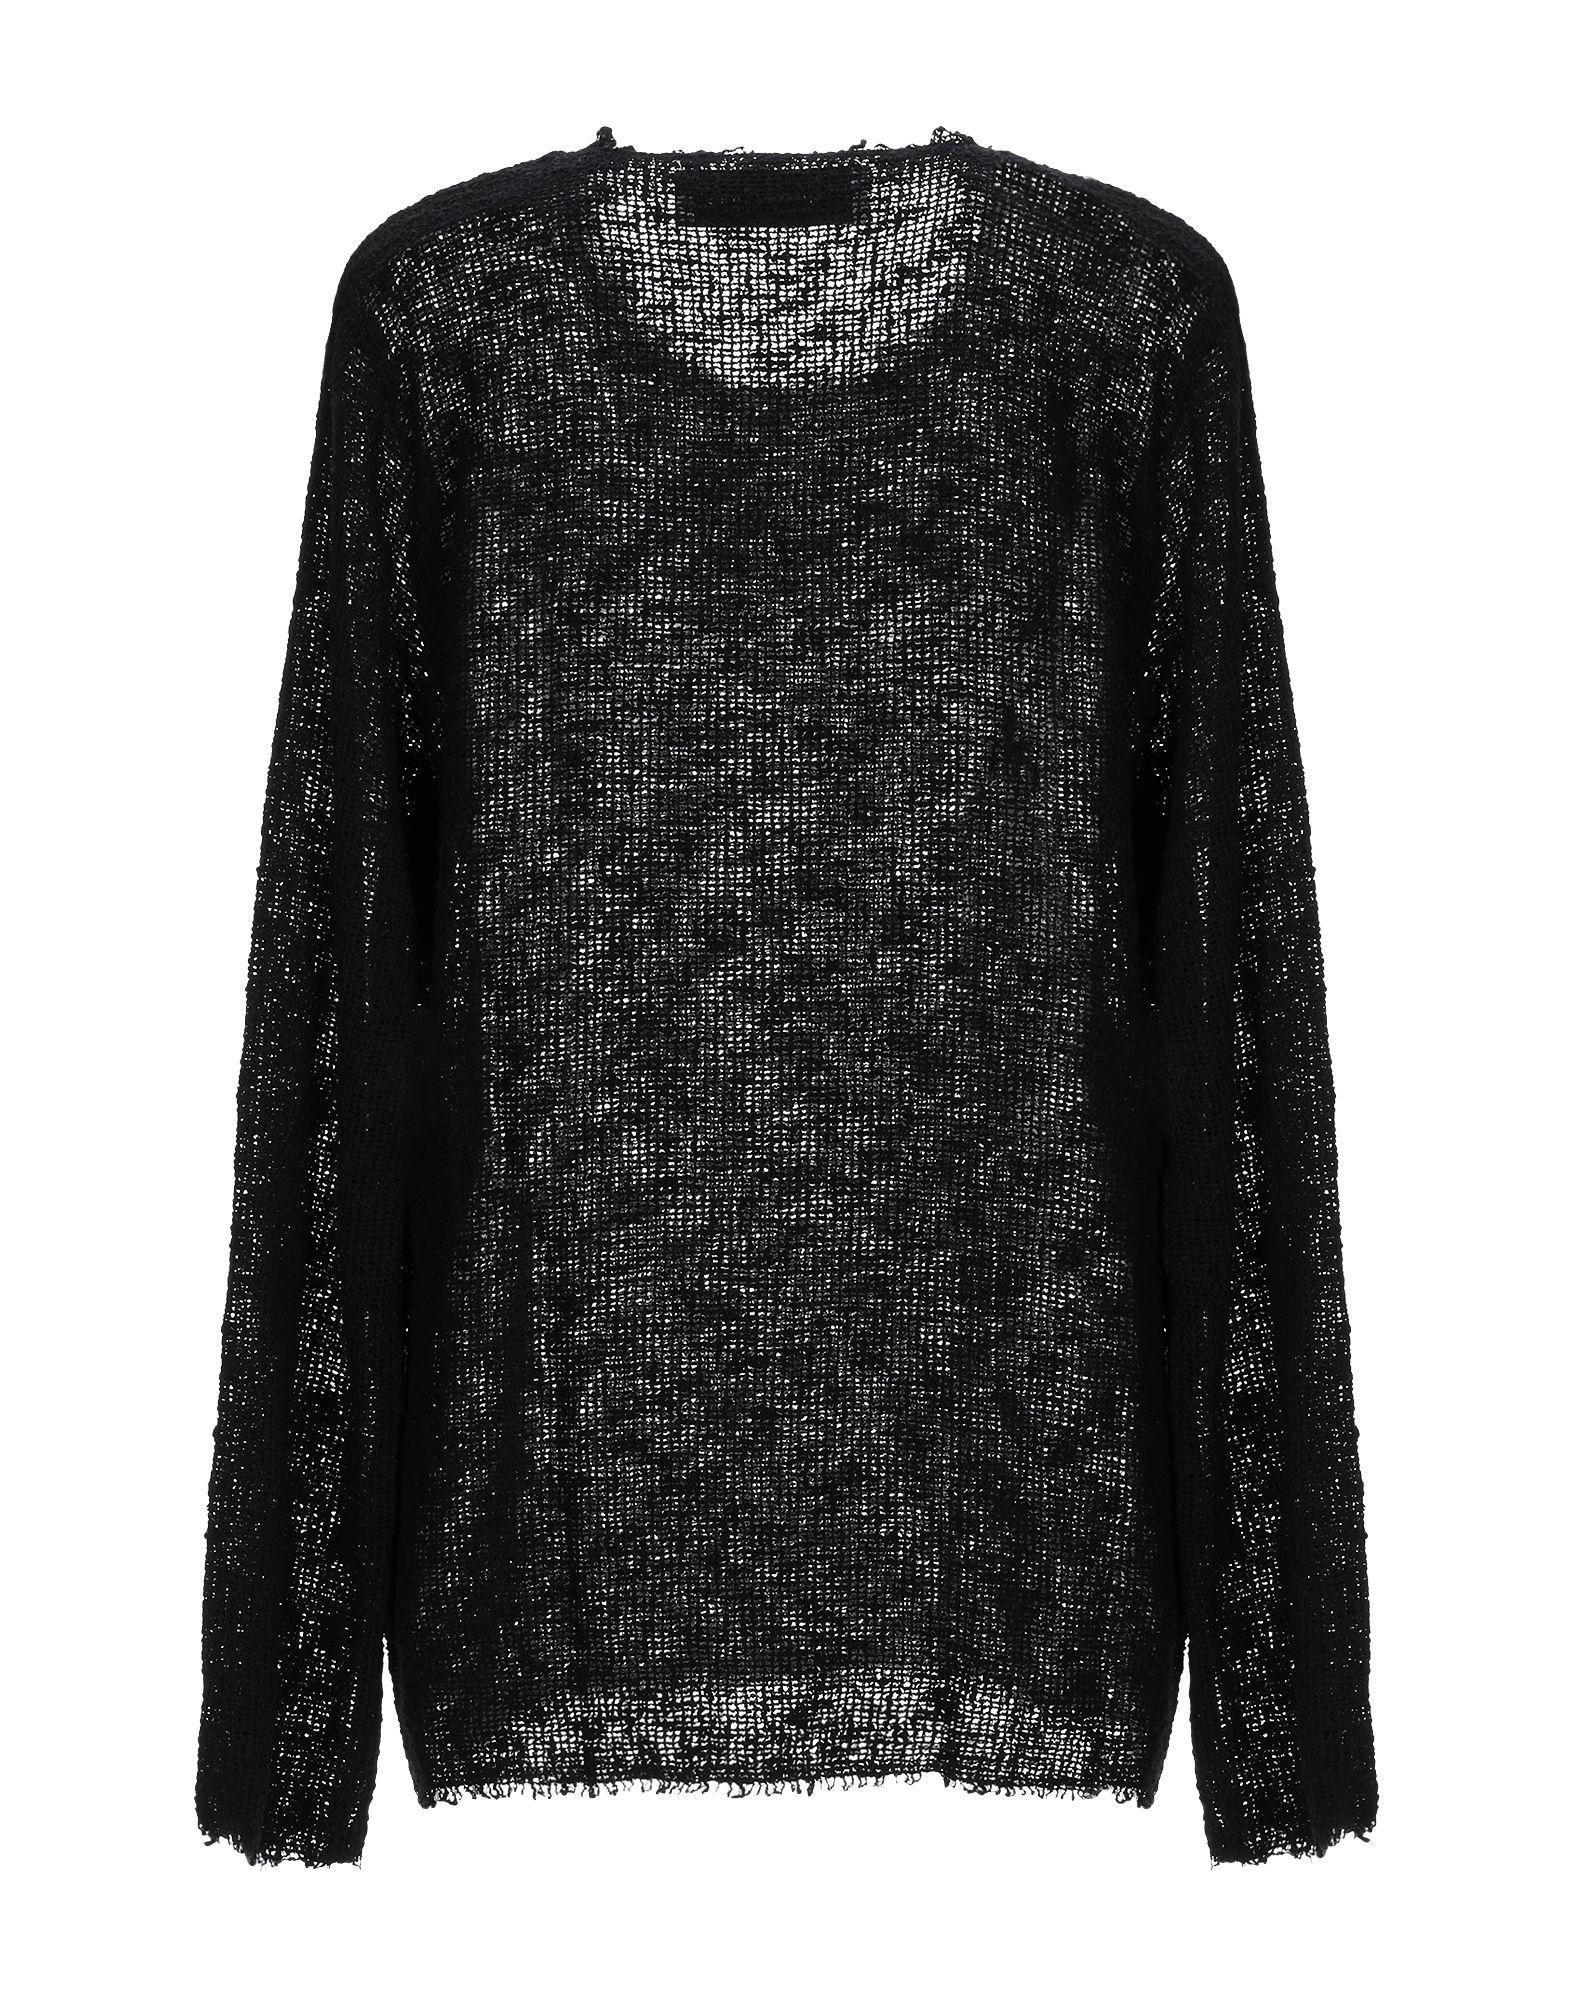 Lyst - Pullover Iro en coloris Noir 00f36255c5e6